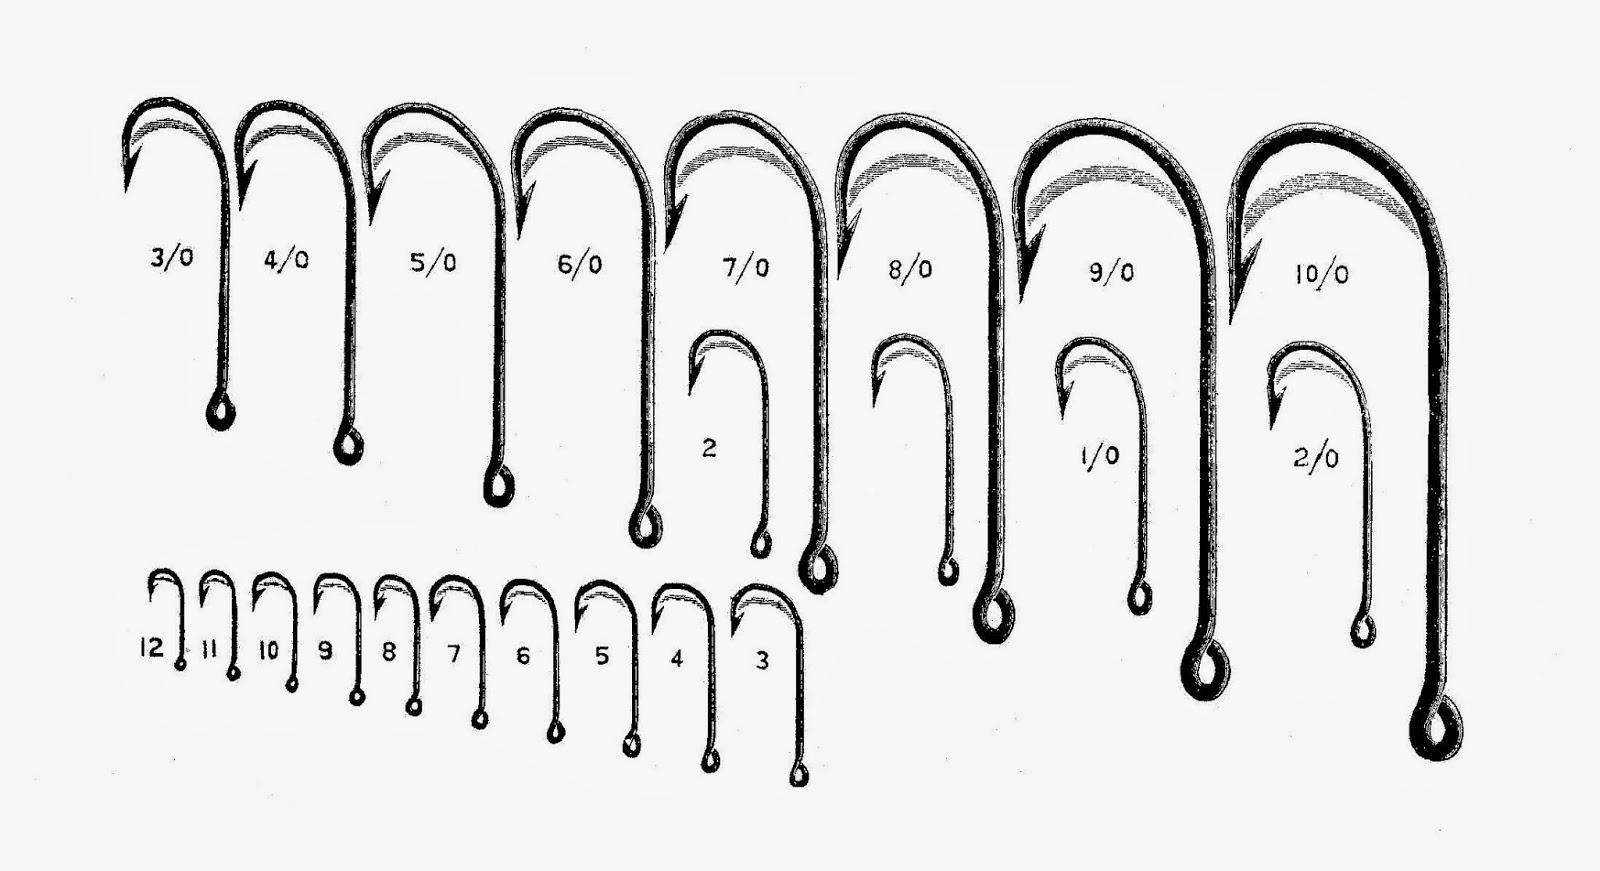 fishing hooks sizes - DriverLayer Search Engine - photo#26